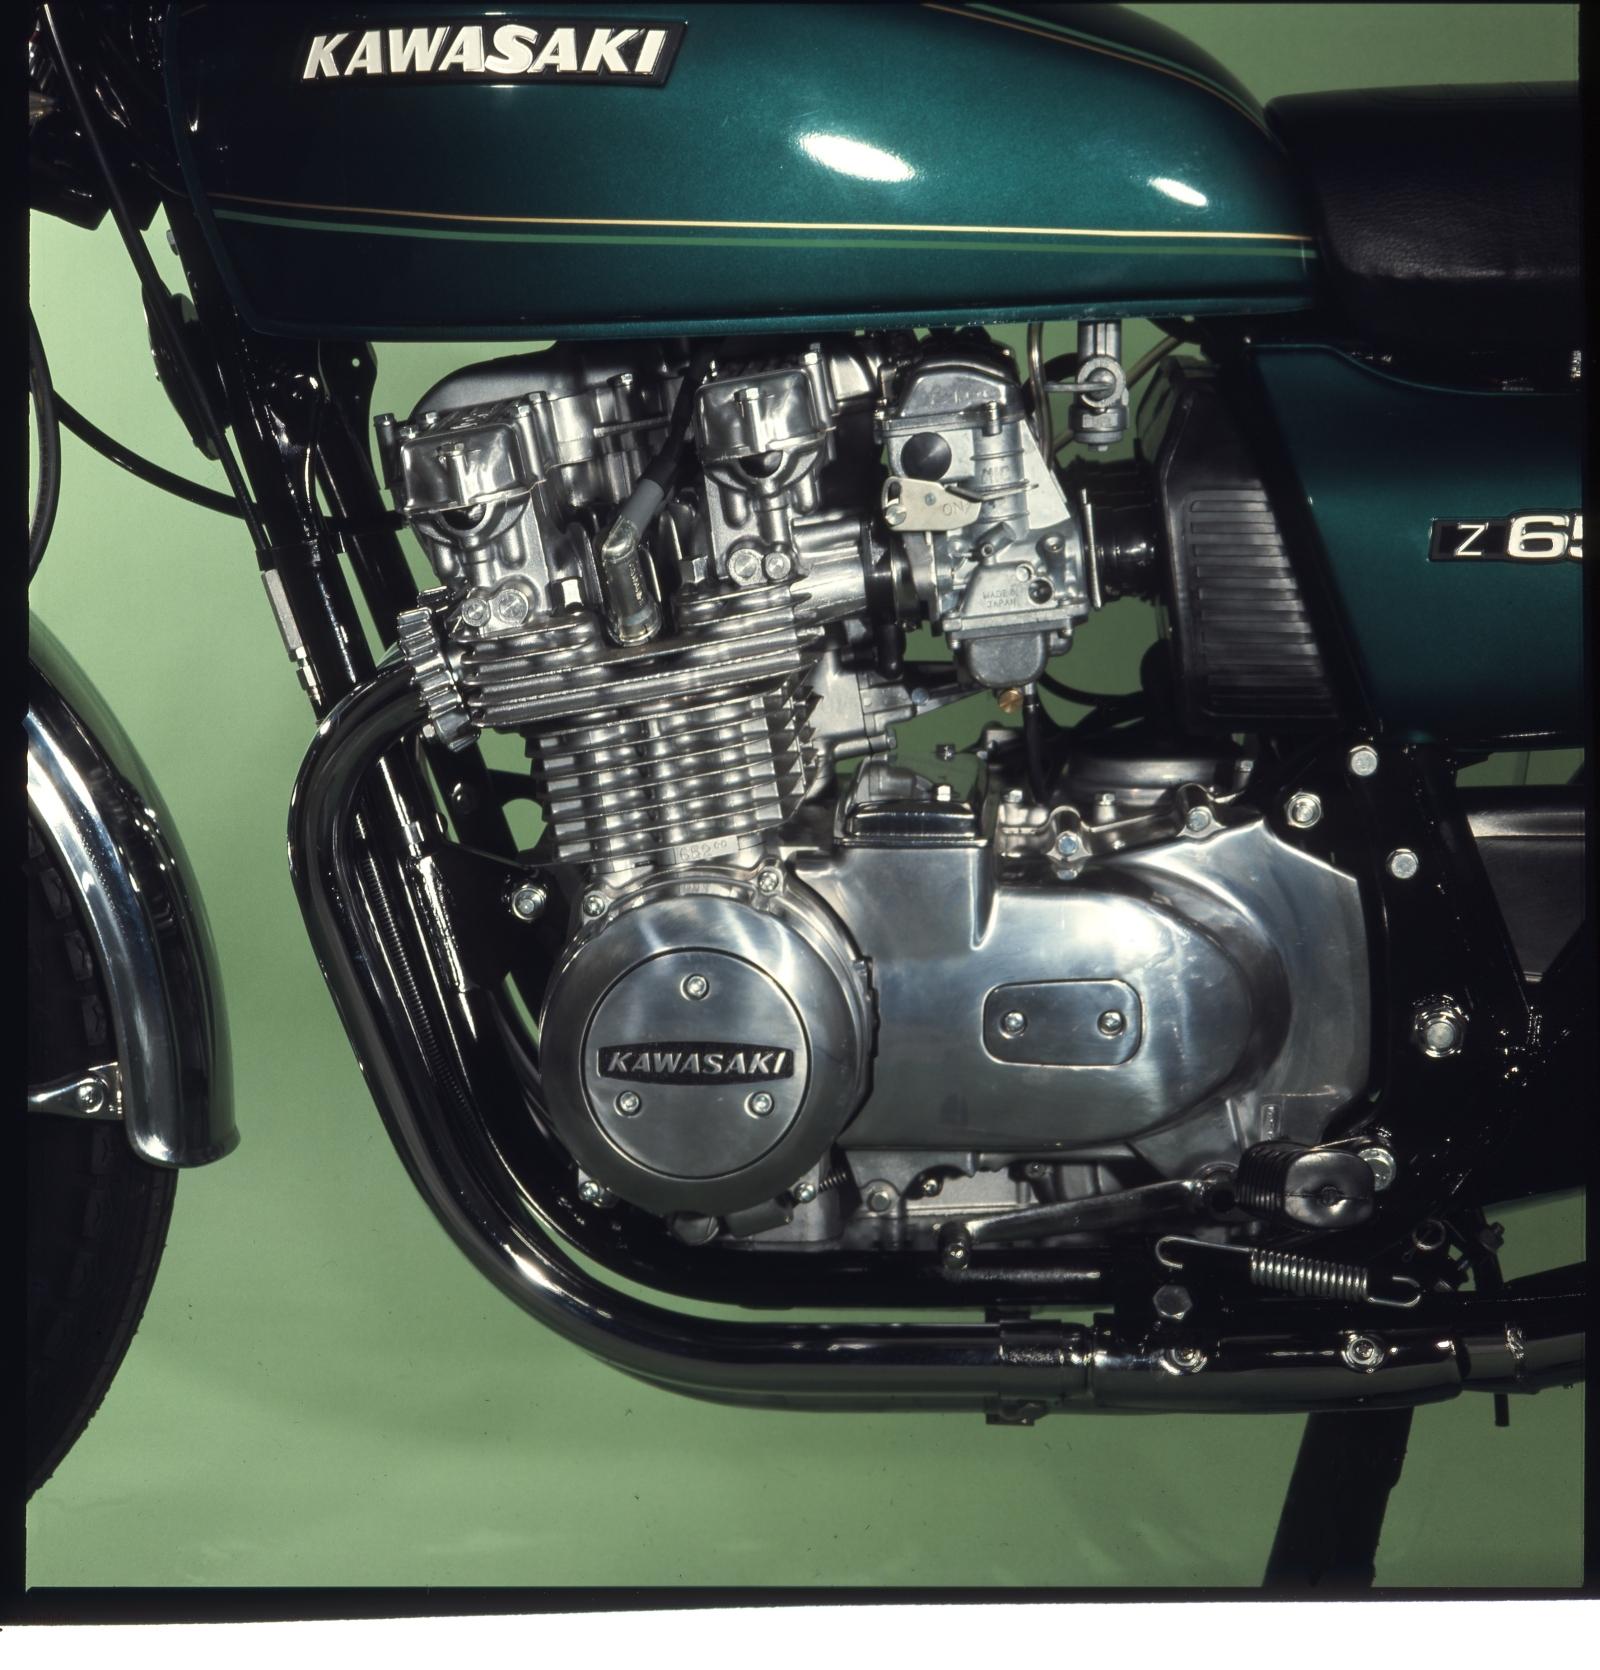 Kawasaki Z 1000 1974 Replica Replacement Front Brake Lever